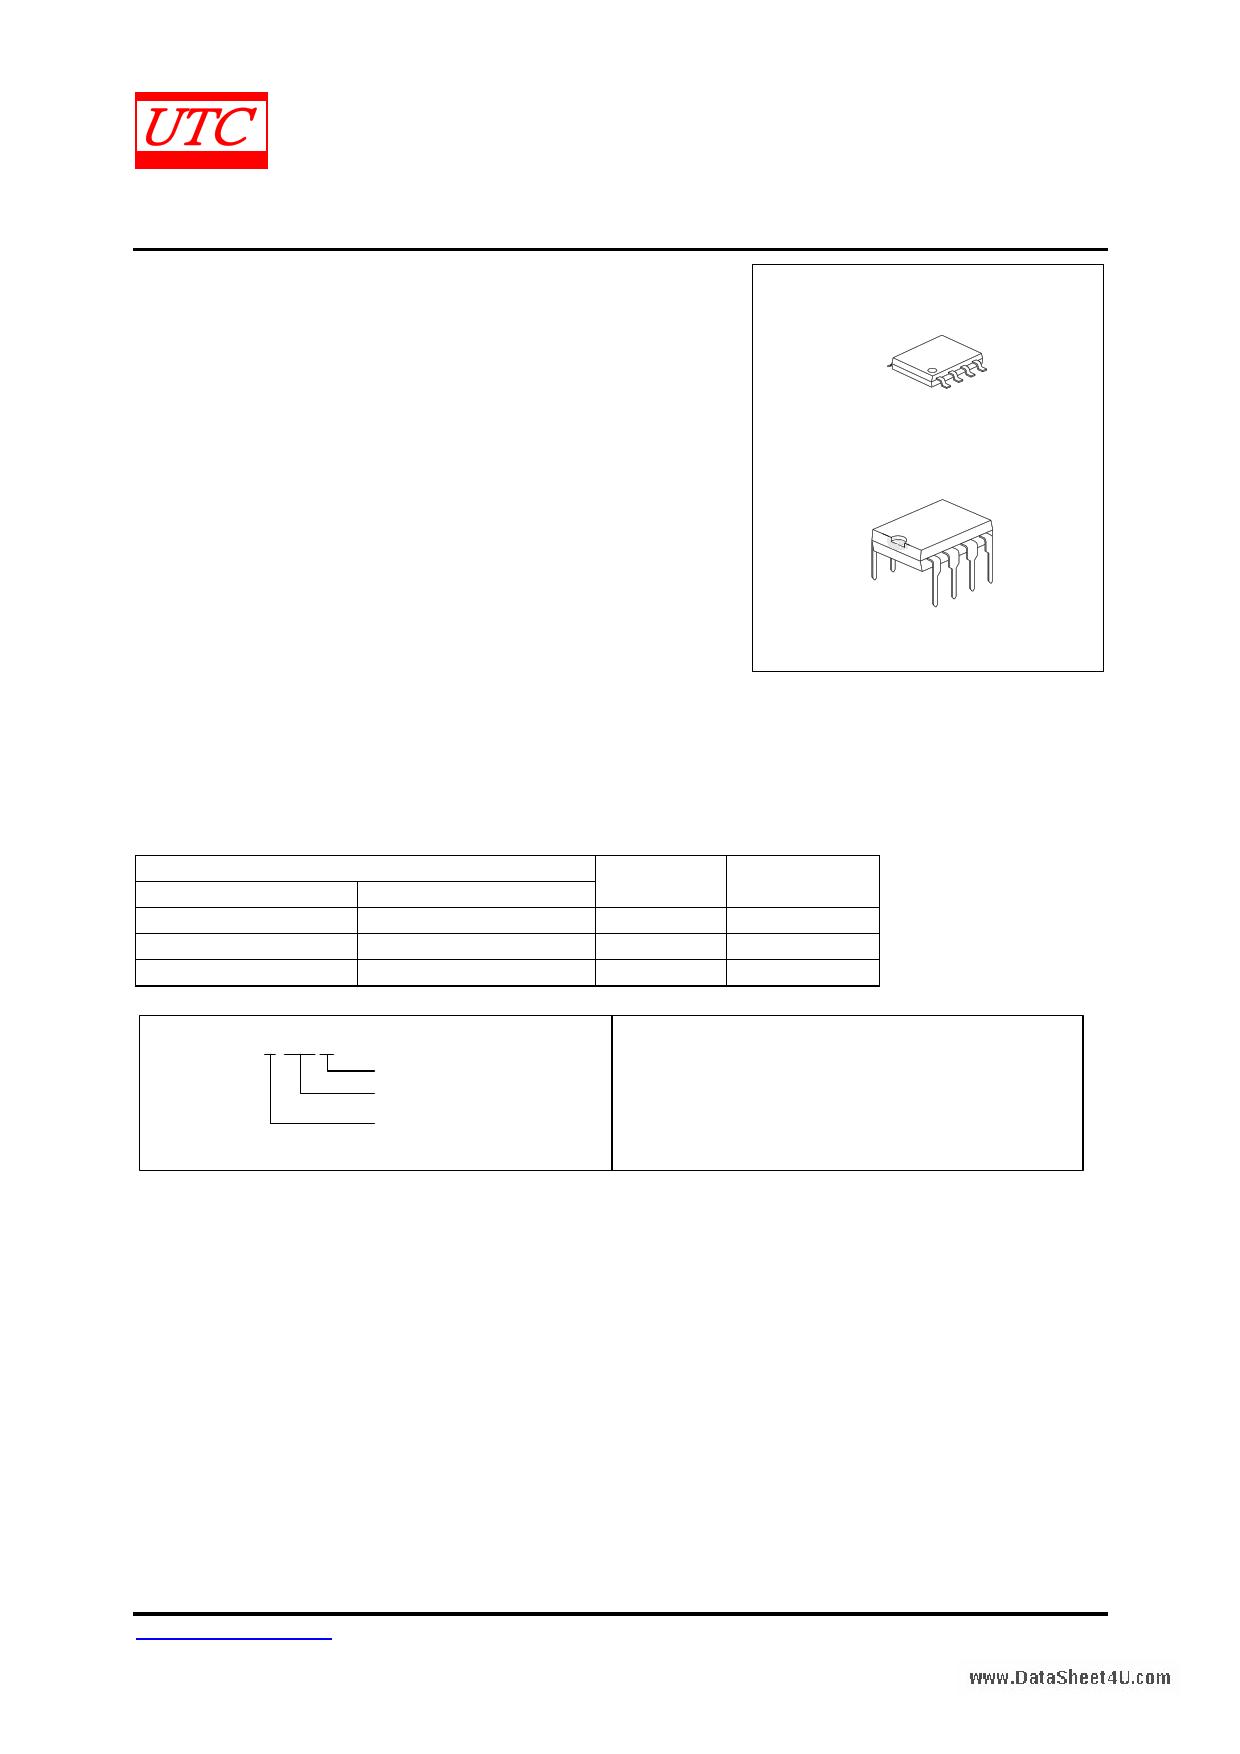 A2804 datasheet, circuit